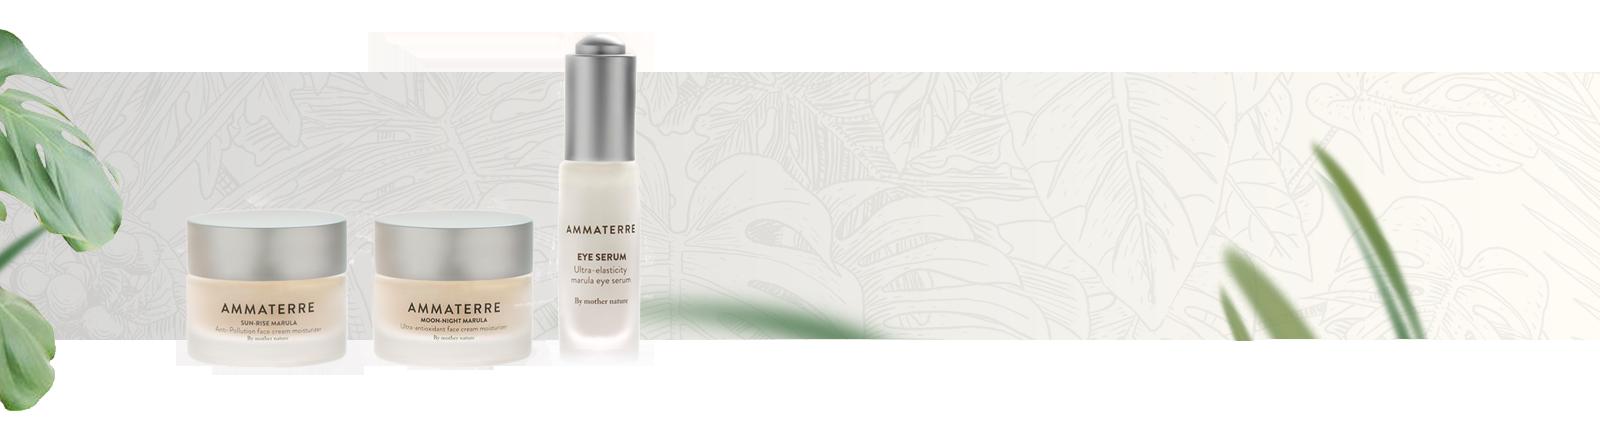 Ammaterre Marula Products -